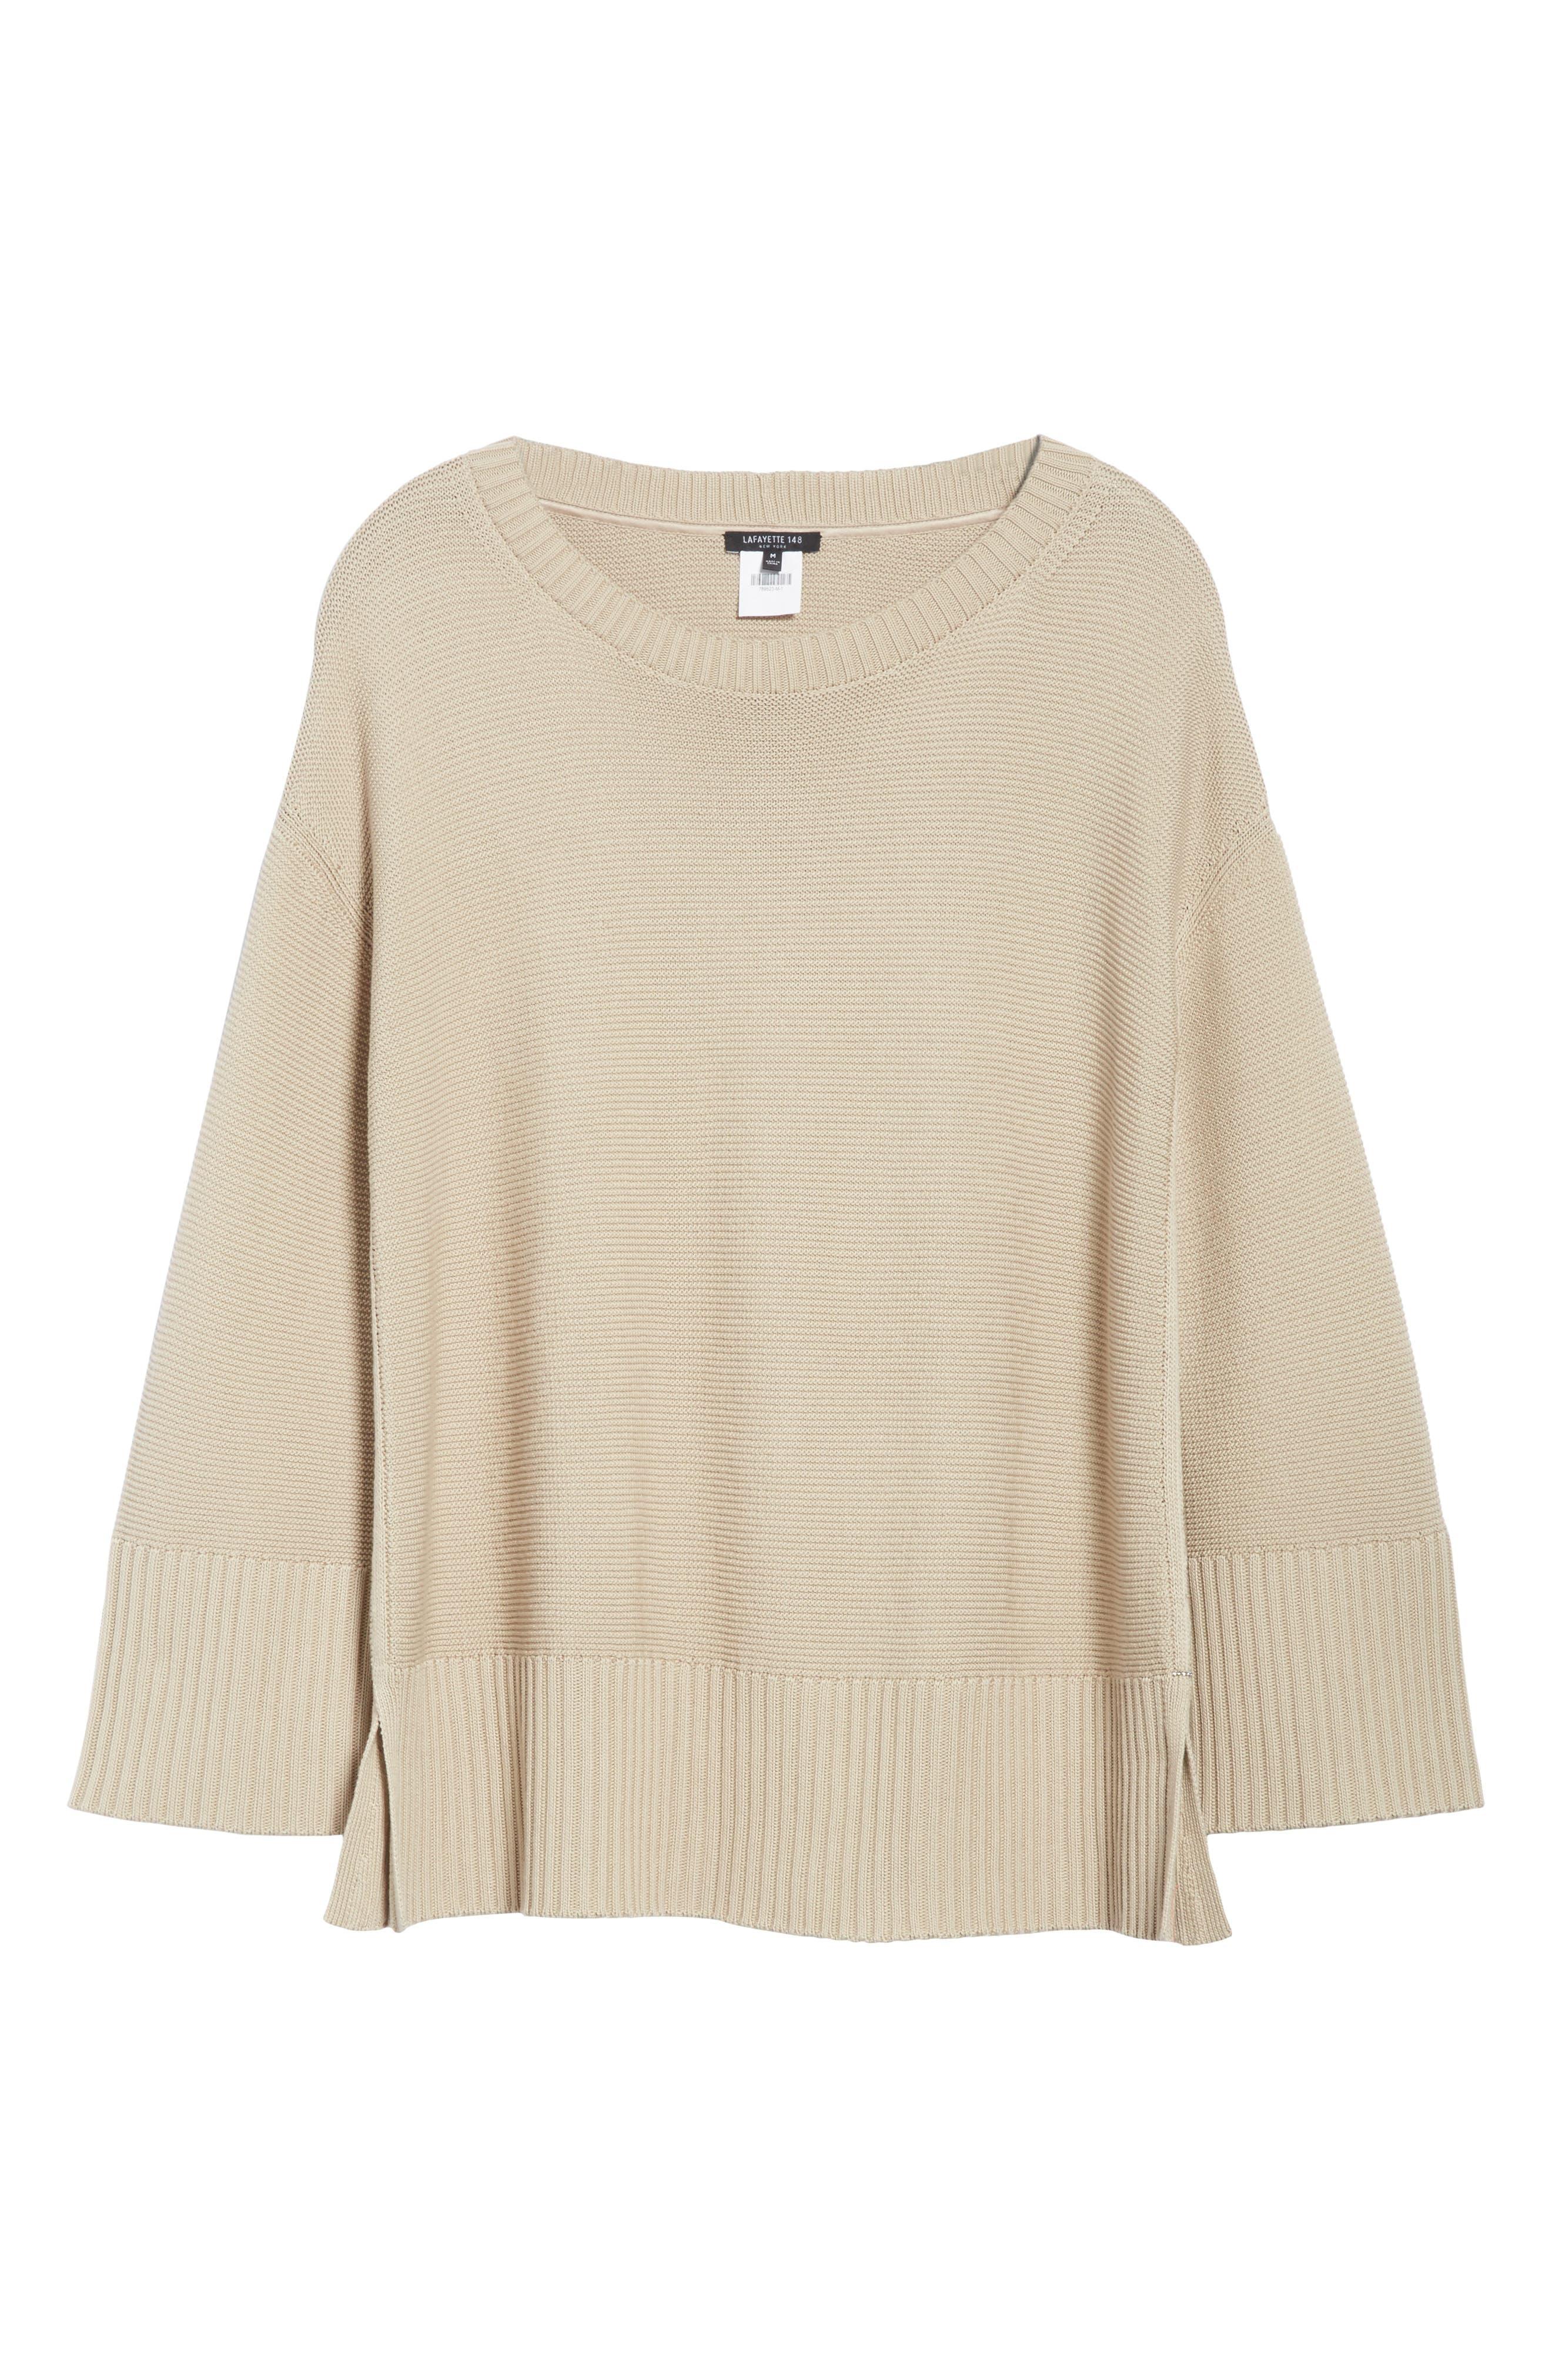 Cotton & Silk Sweater,                             Alternate thumbnail 6, color,                             Khaki